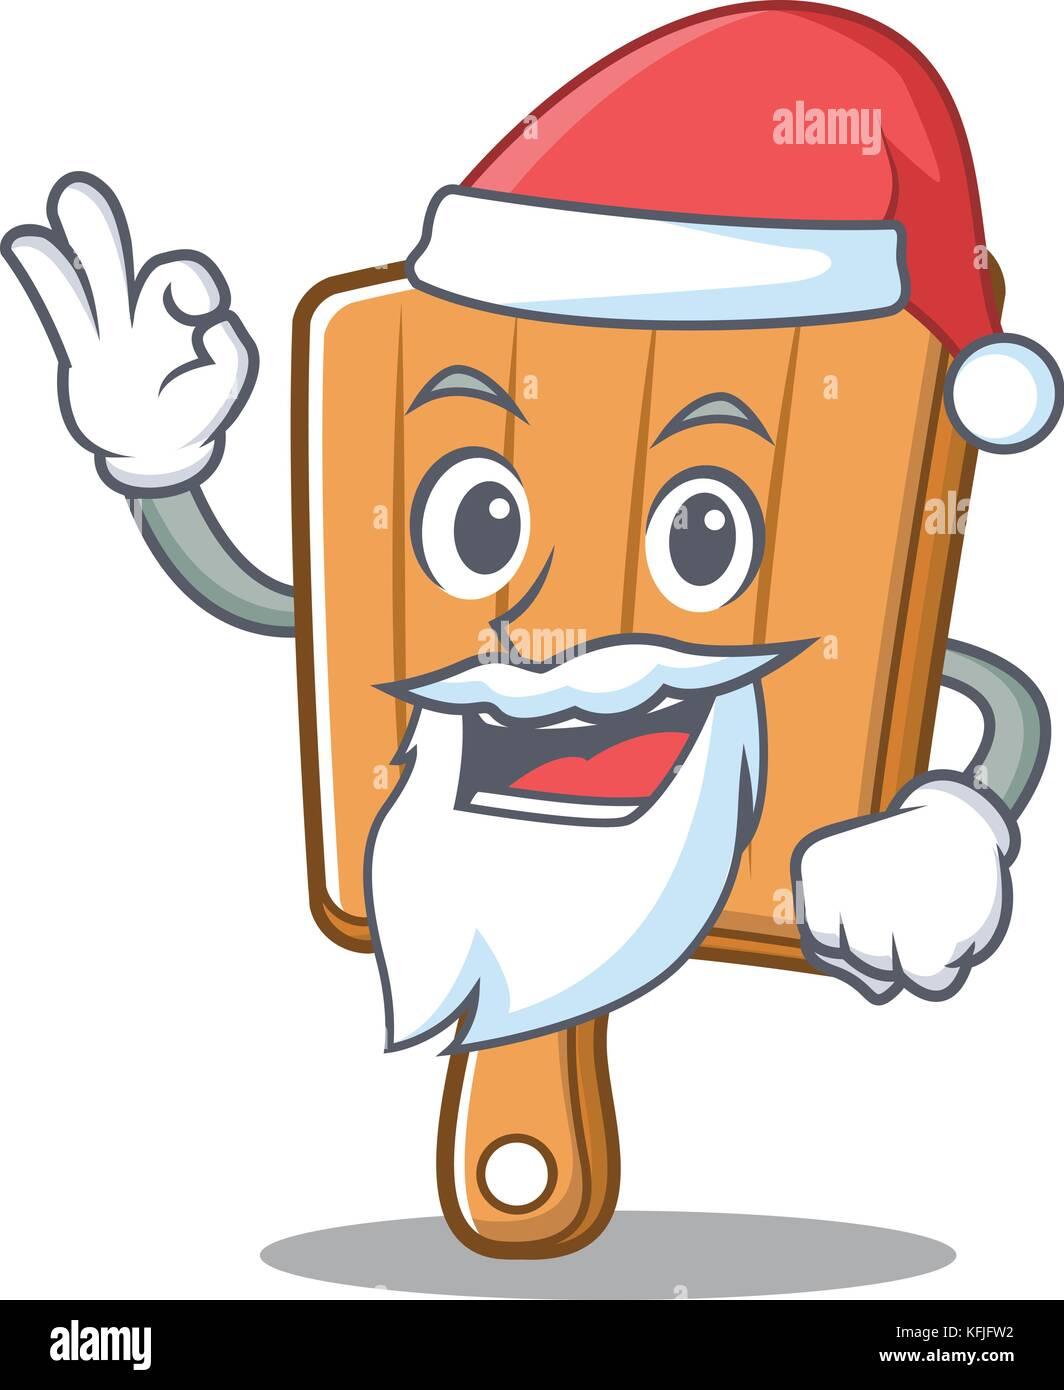 Santa Küche bord Charakter Cartoon Vektor Abbildung - Bild ...